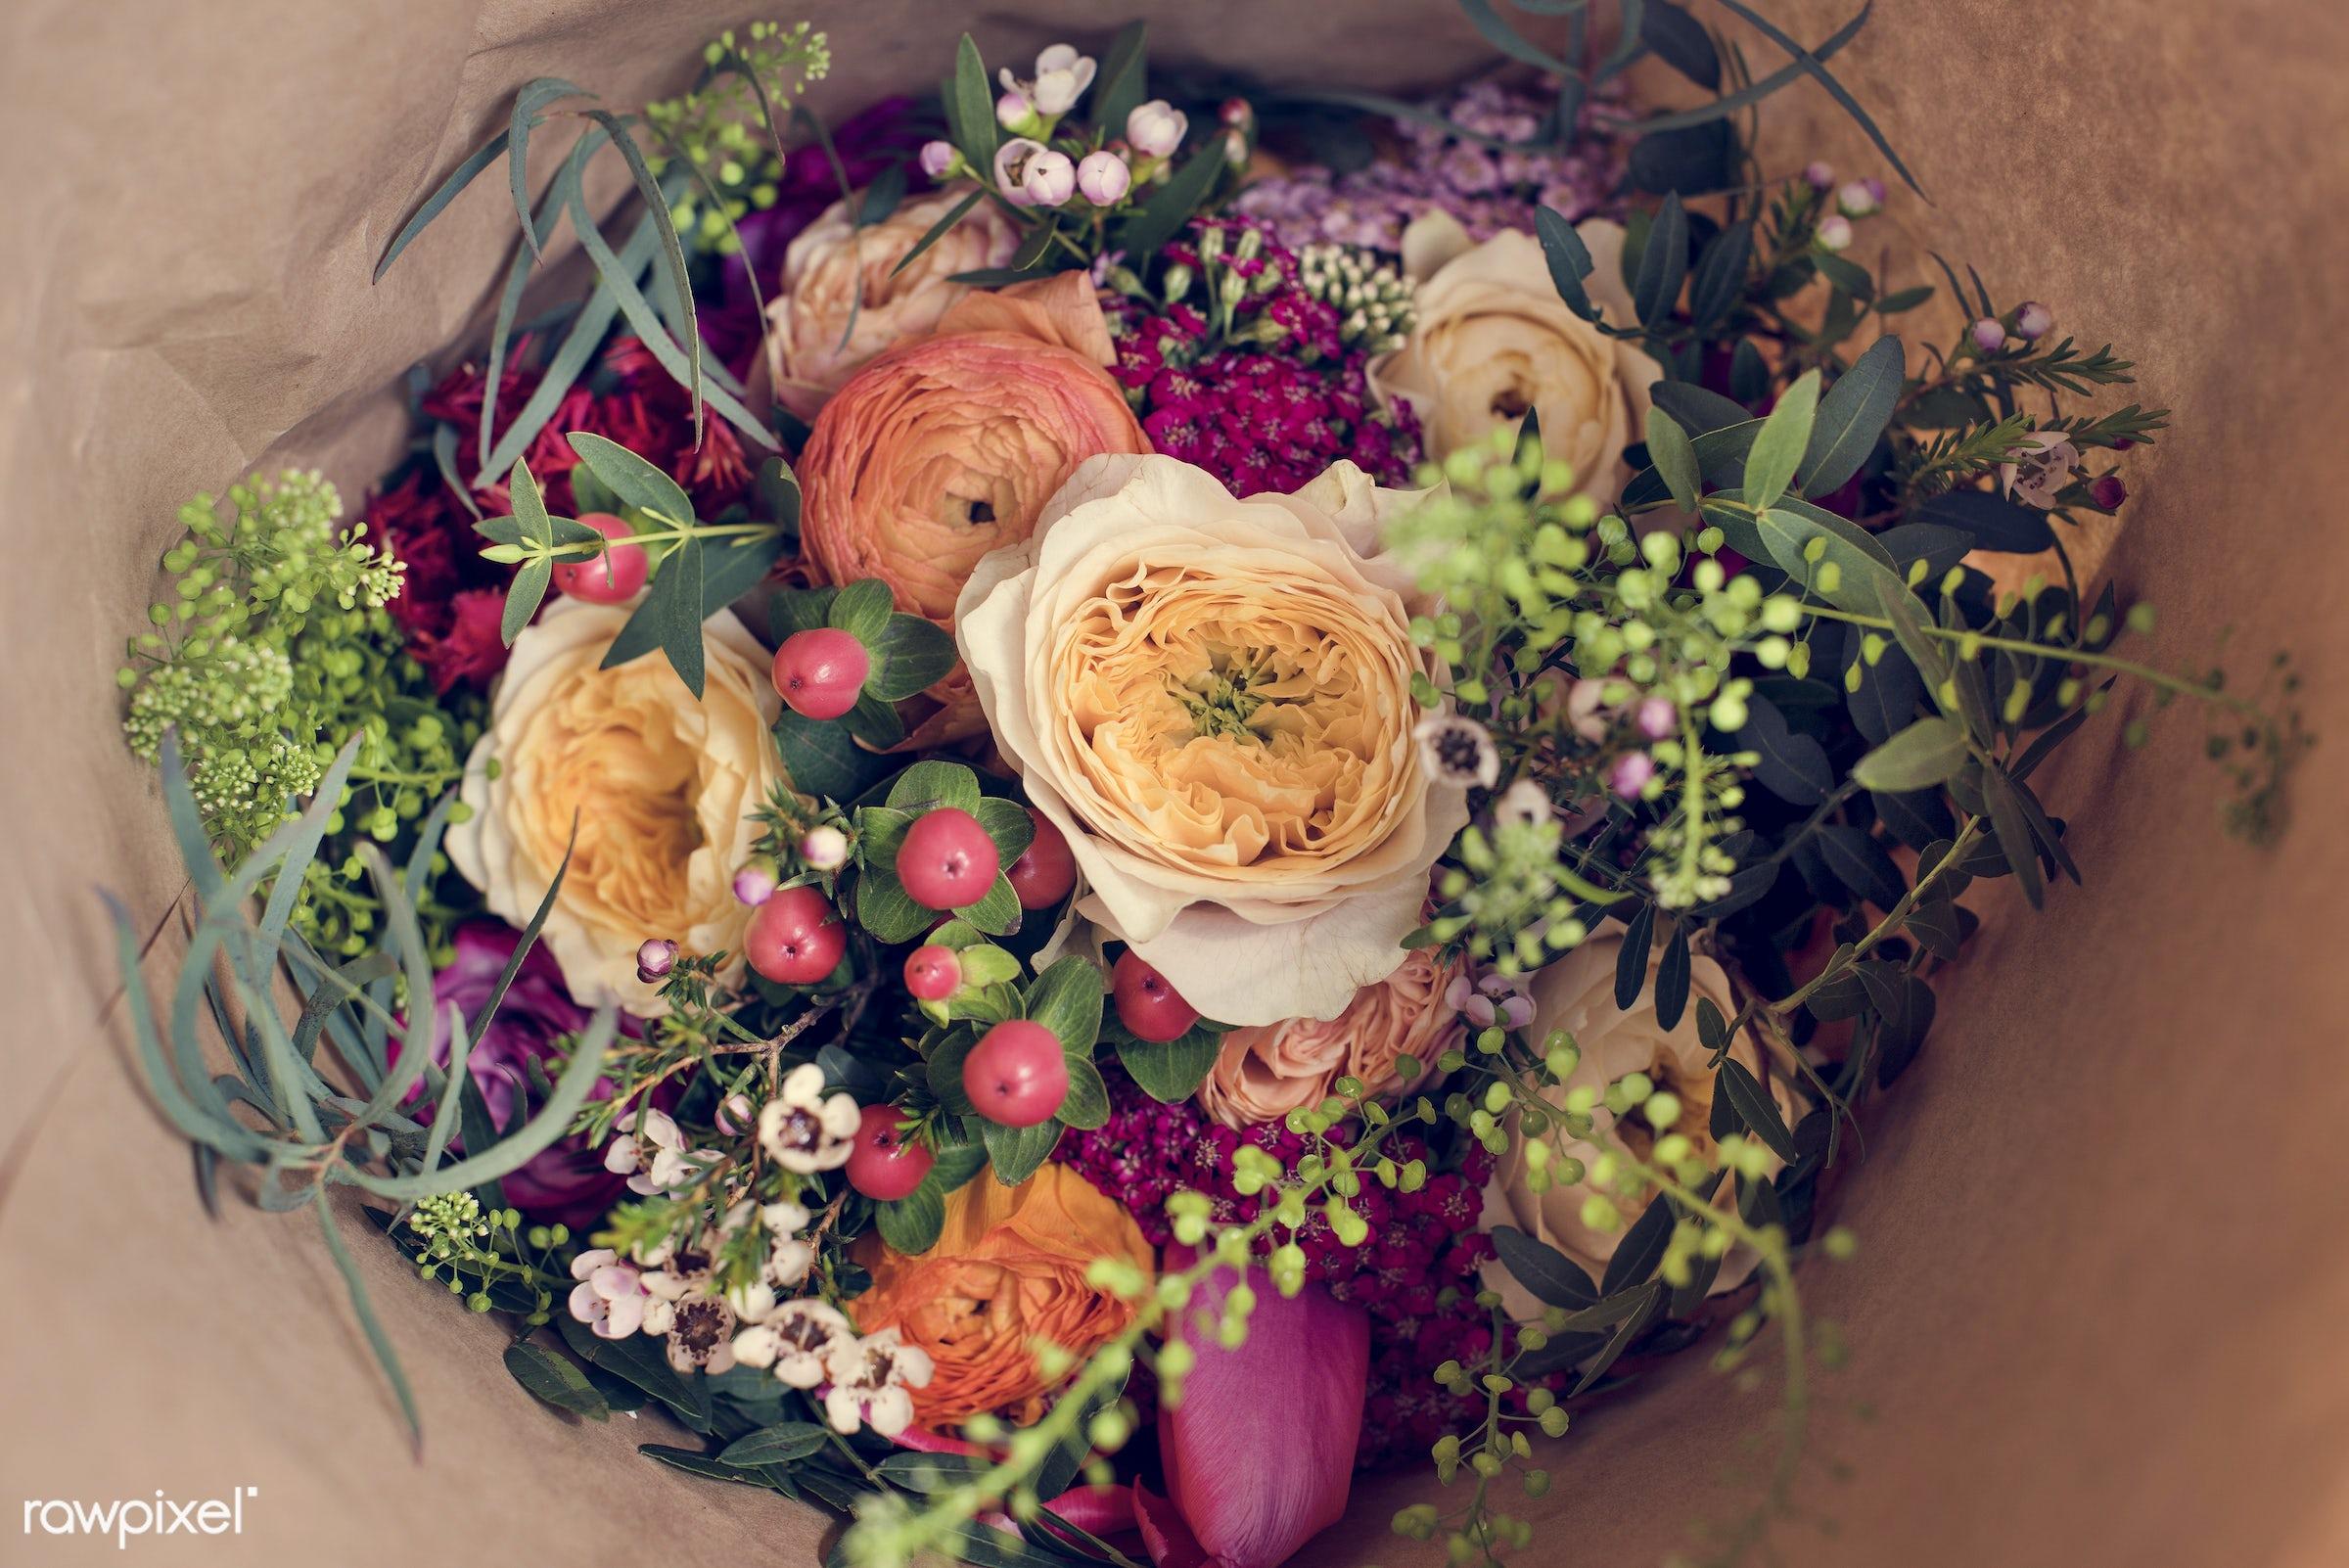 bouquet, craft, aromatic, decorative, handicraft, beauty, spring, rustic, handiwork, blossom, style, nature, vintage, flora...